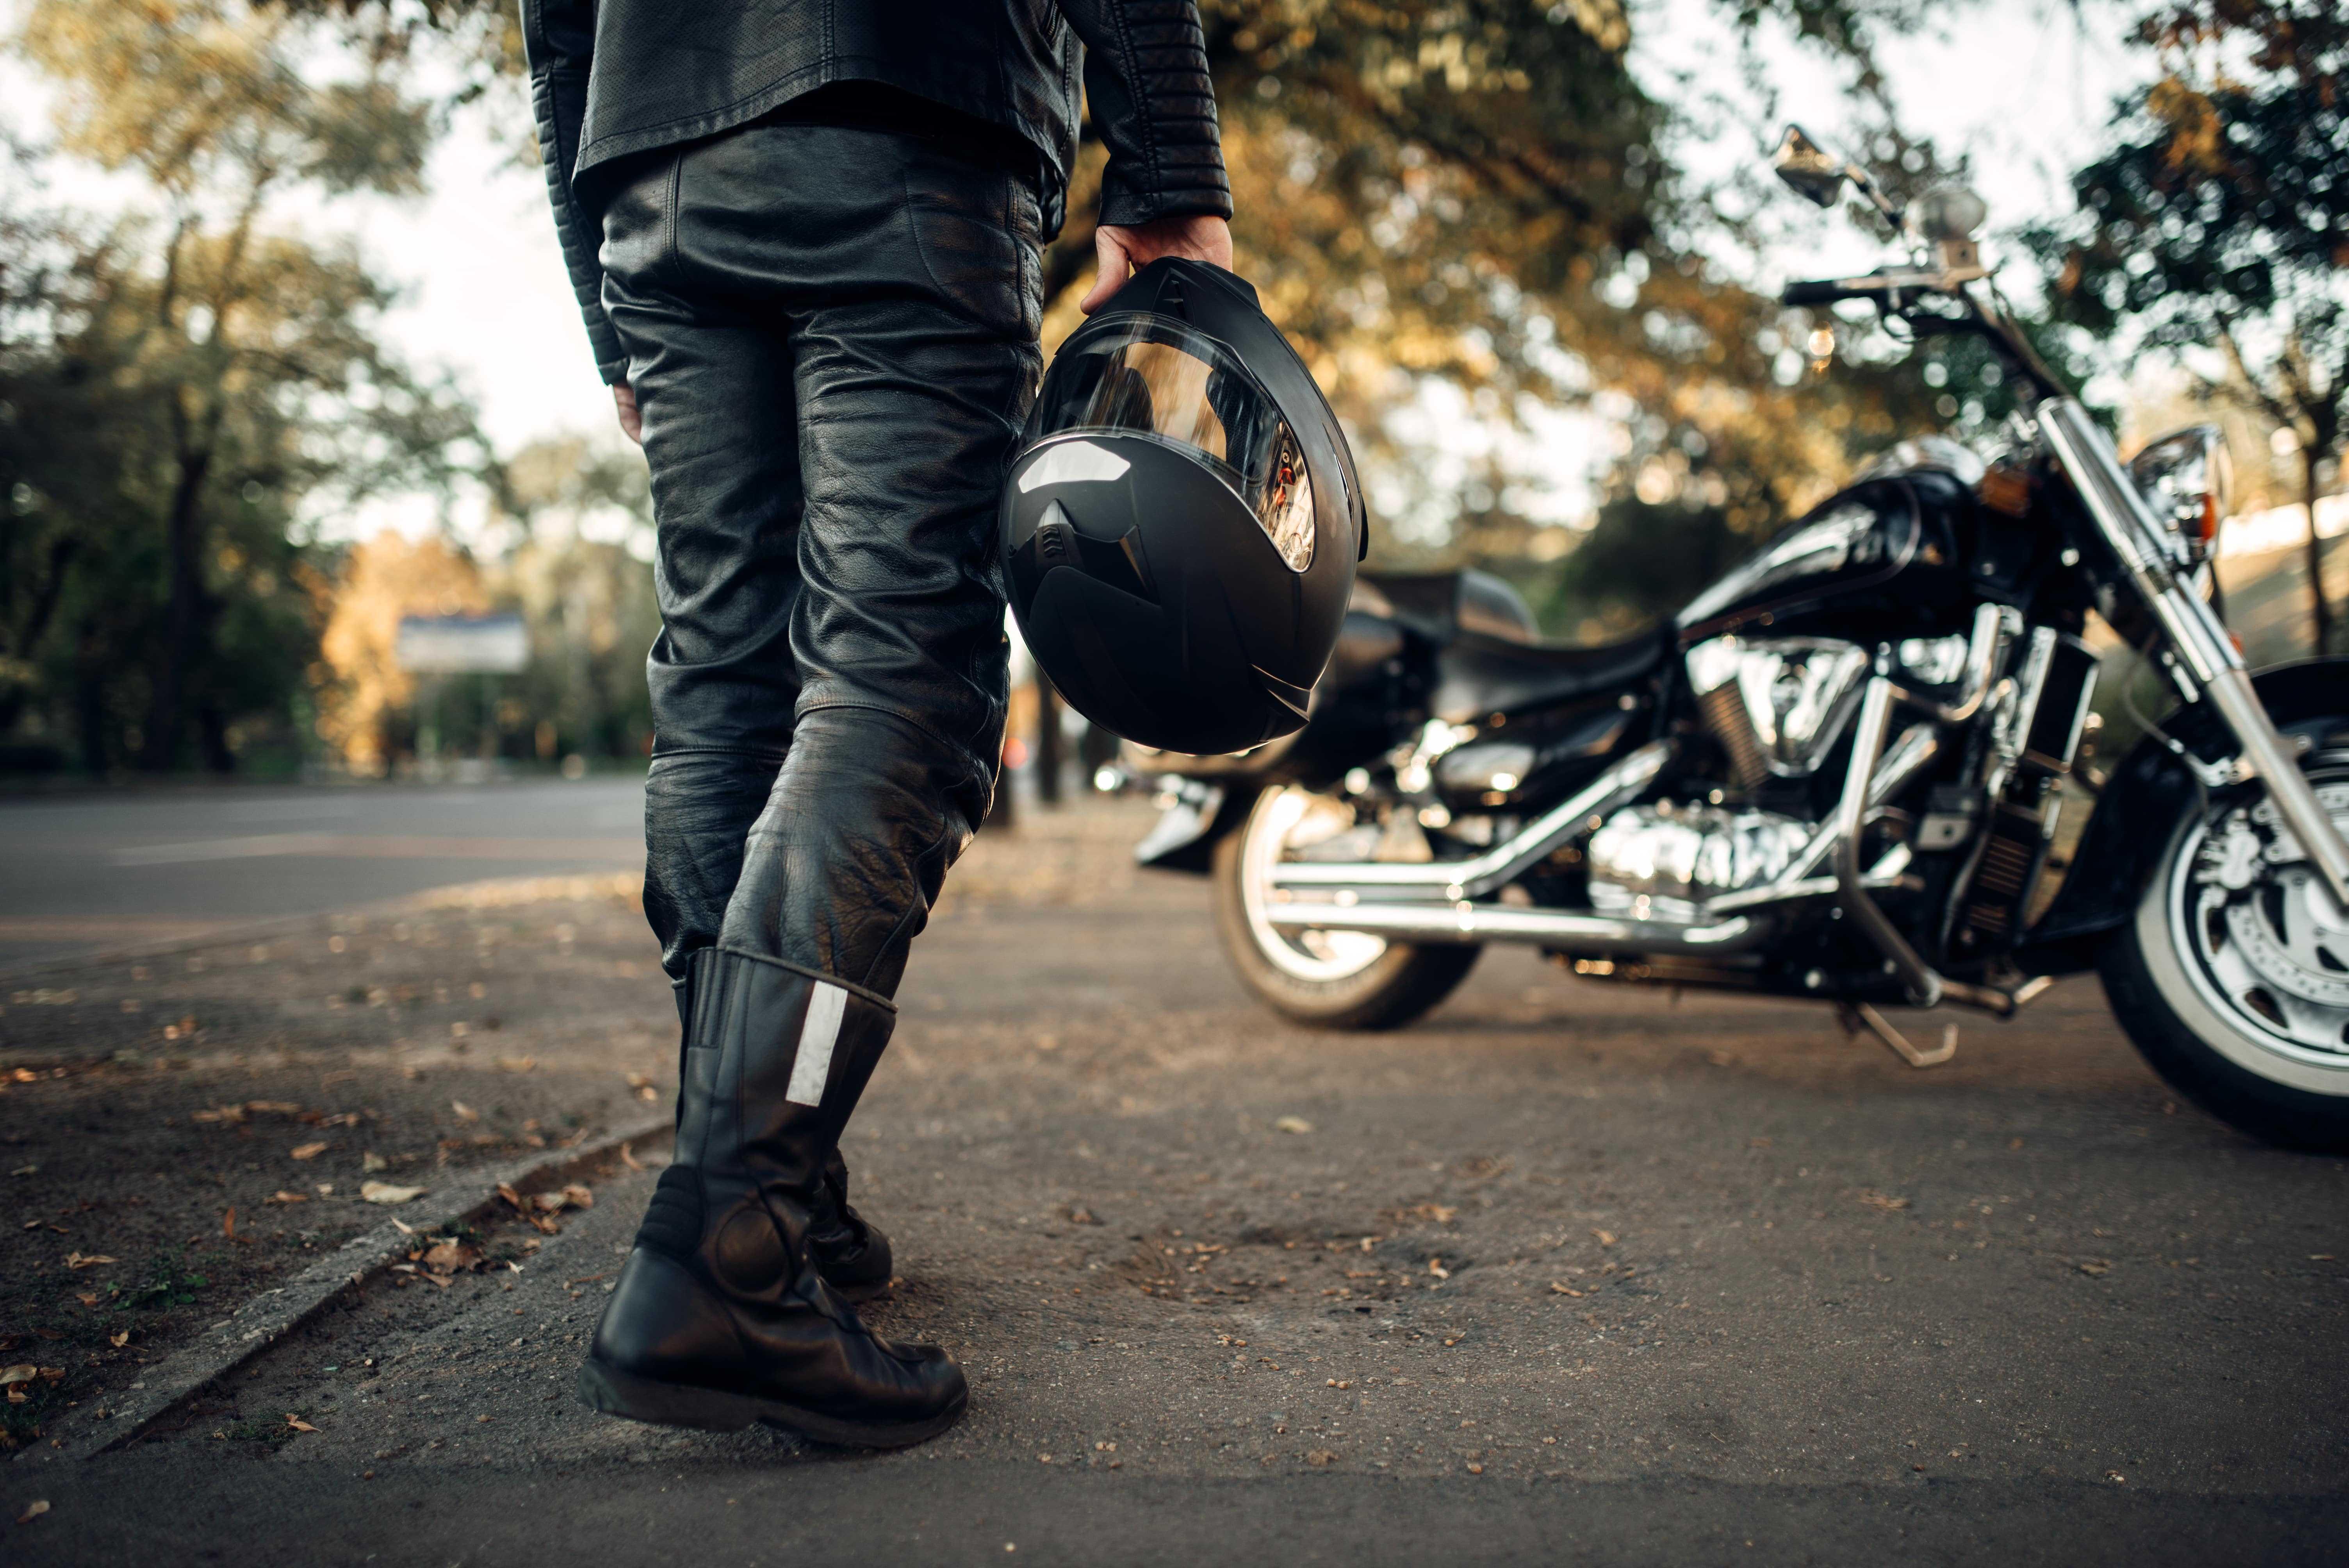 Icona motociclistica: la Harley Davidson